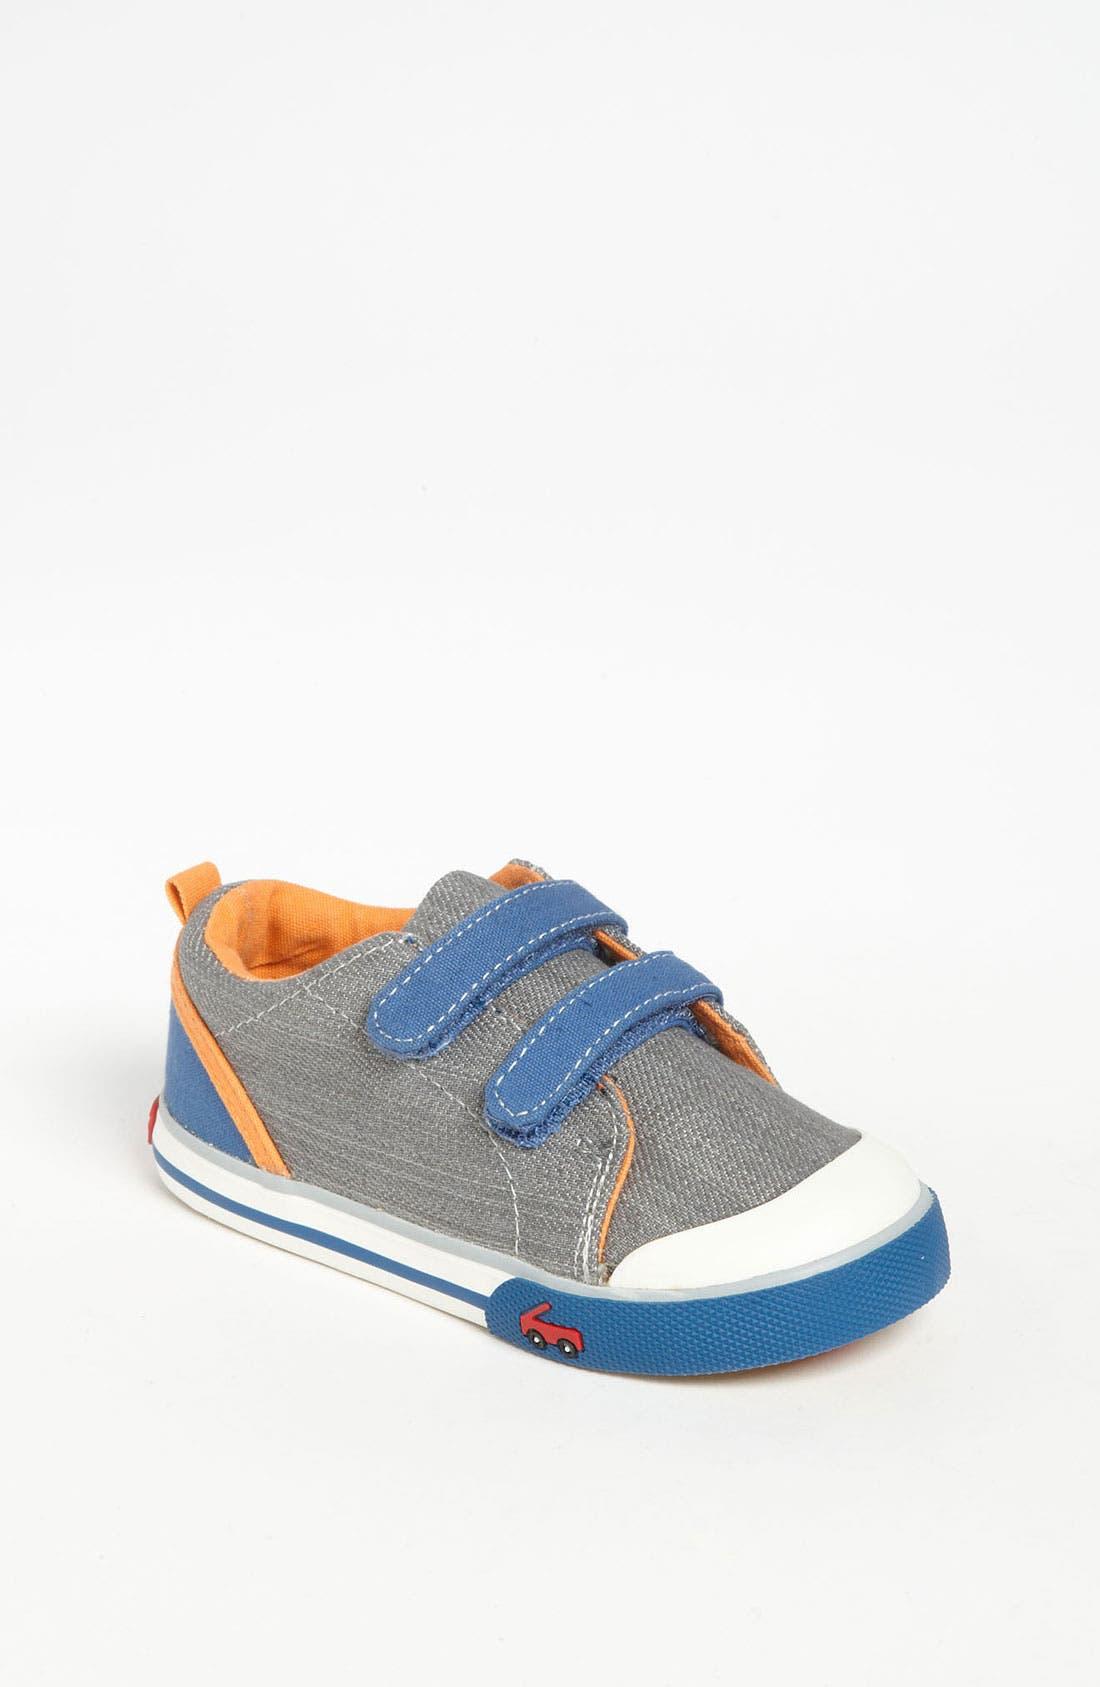 Main Image - See Kai Run 'Esten' Sneaker (Baby, Walker & Toddler)